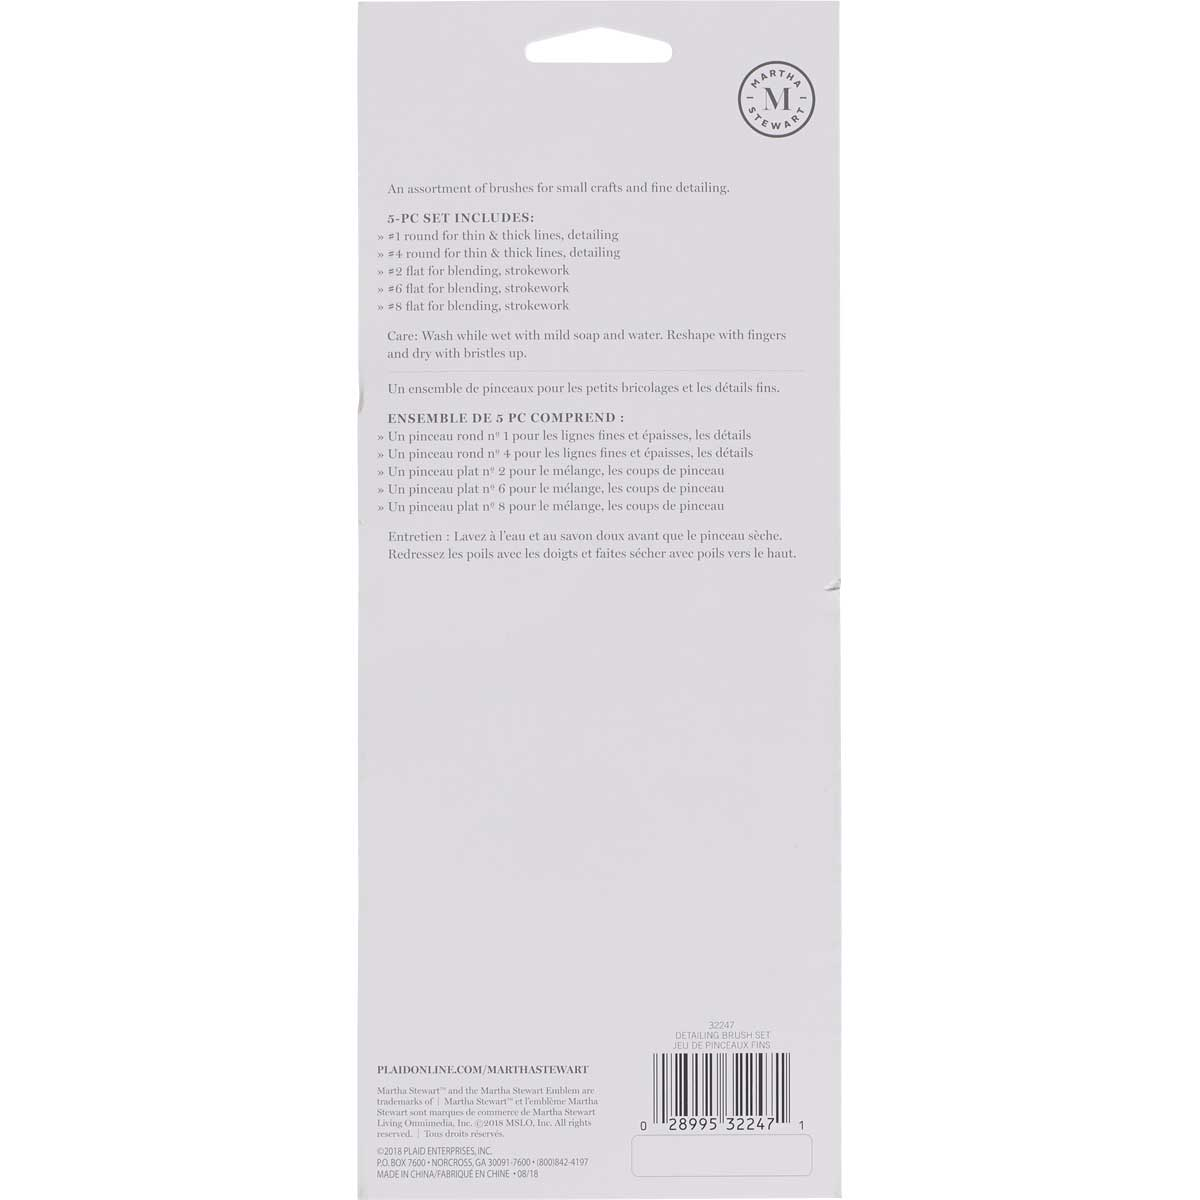 Martha Stewart ® Brush Sets - Detailing Brush Set - 5pc - 32247